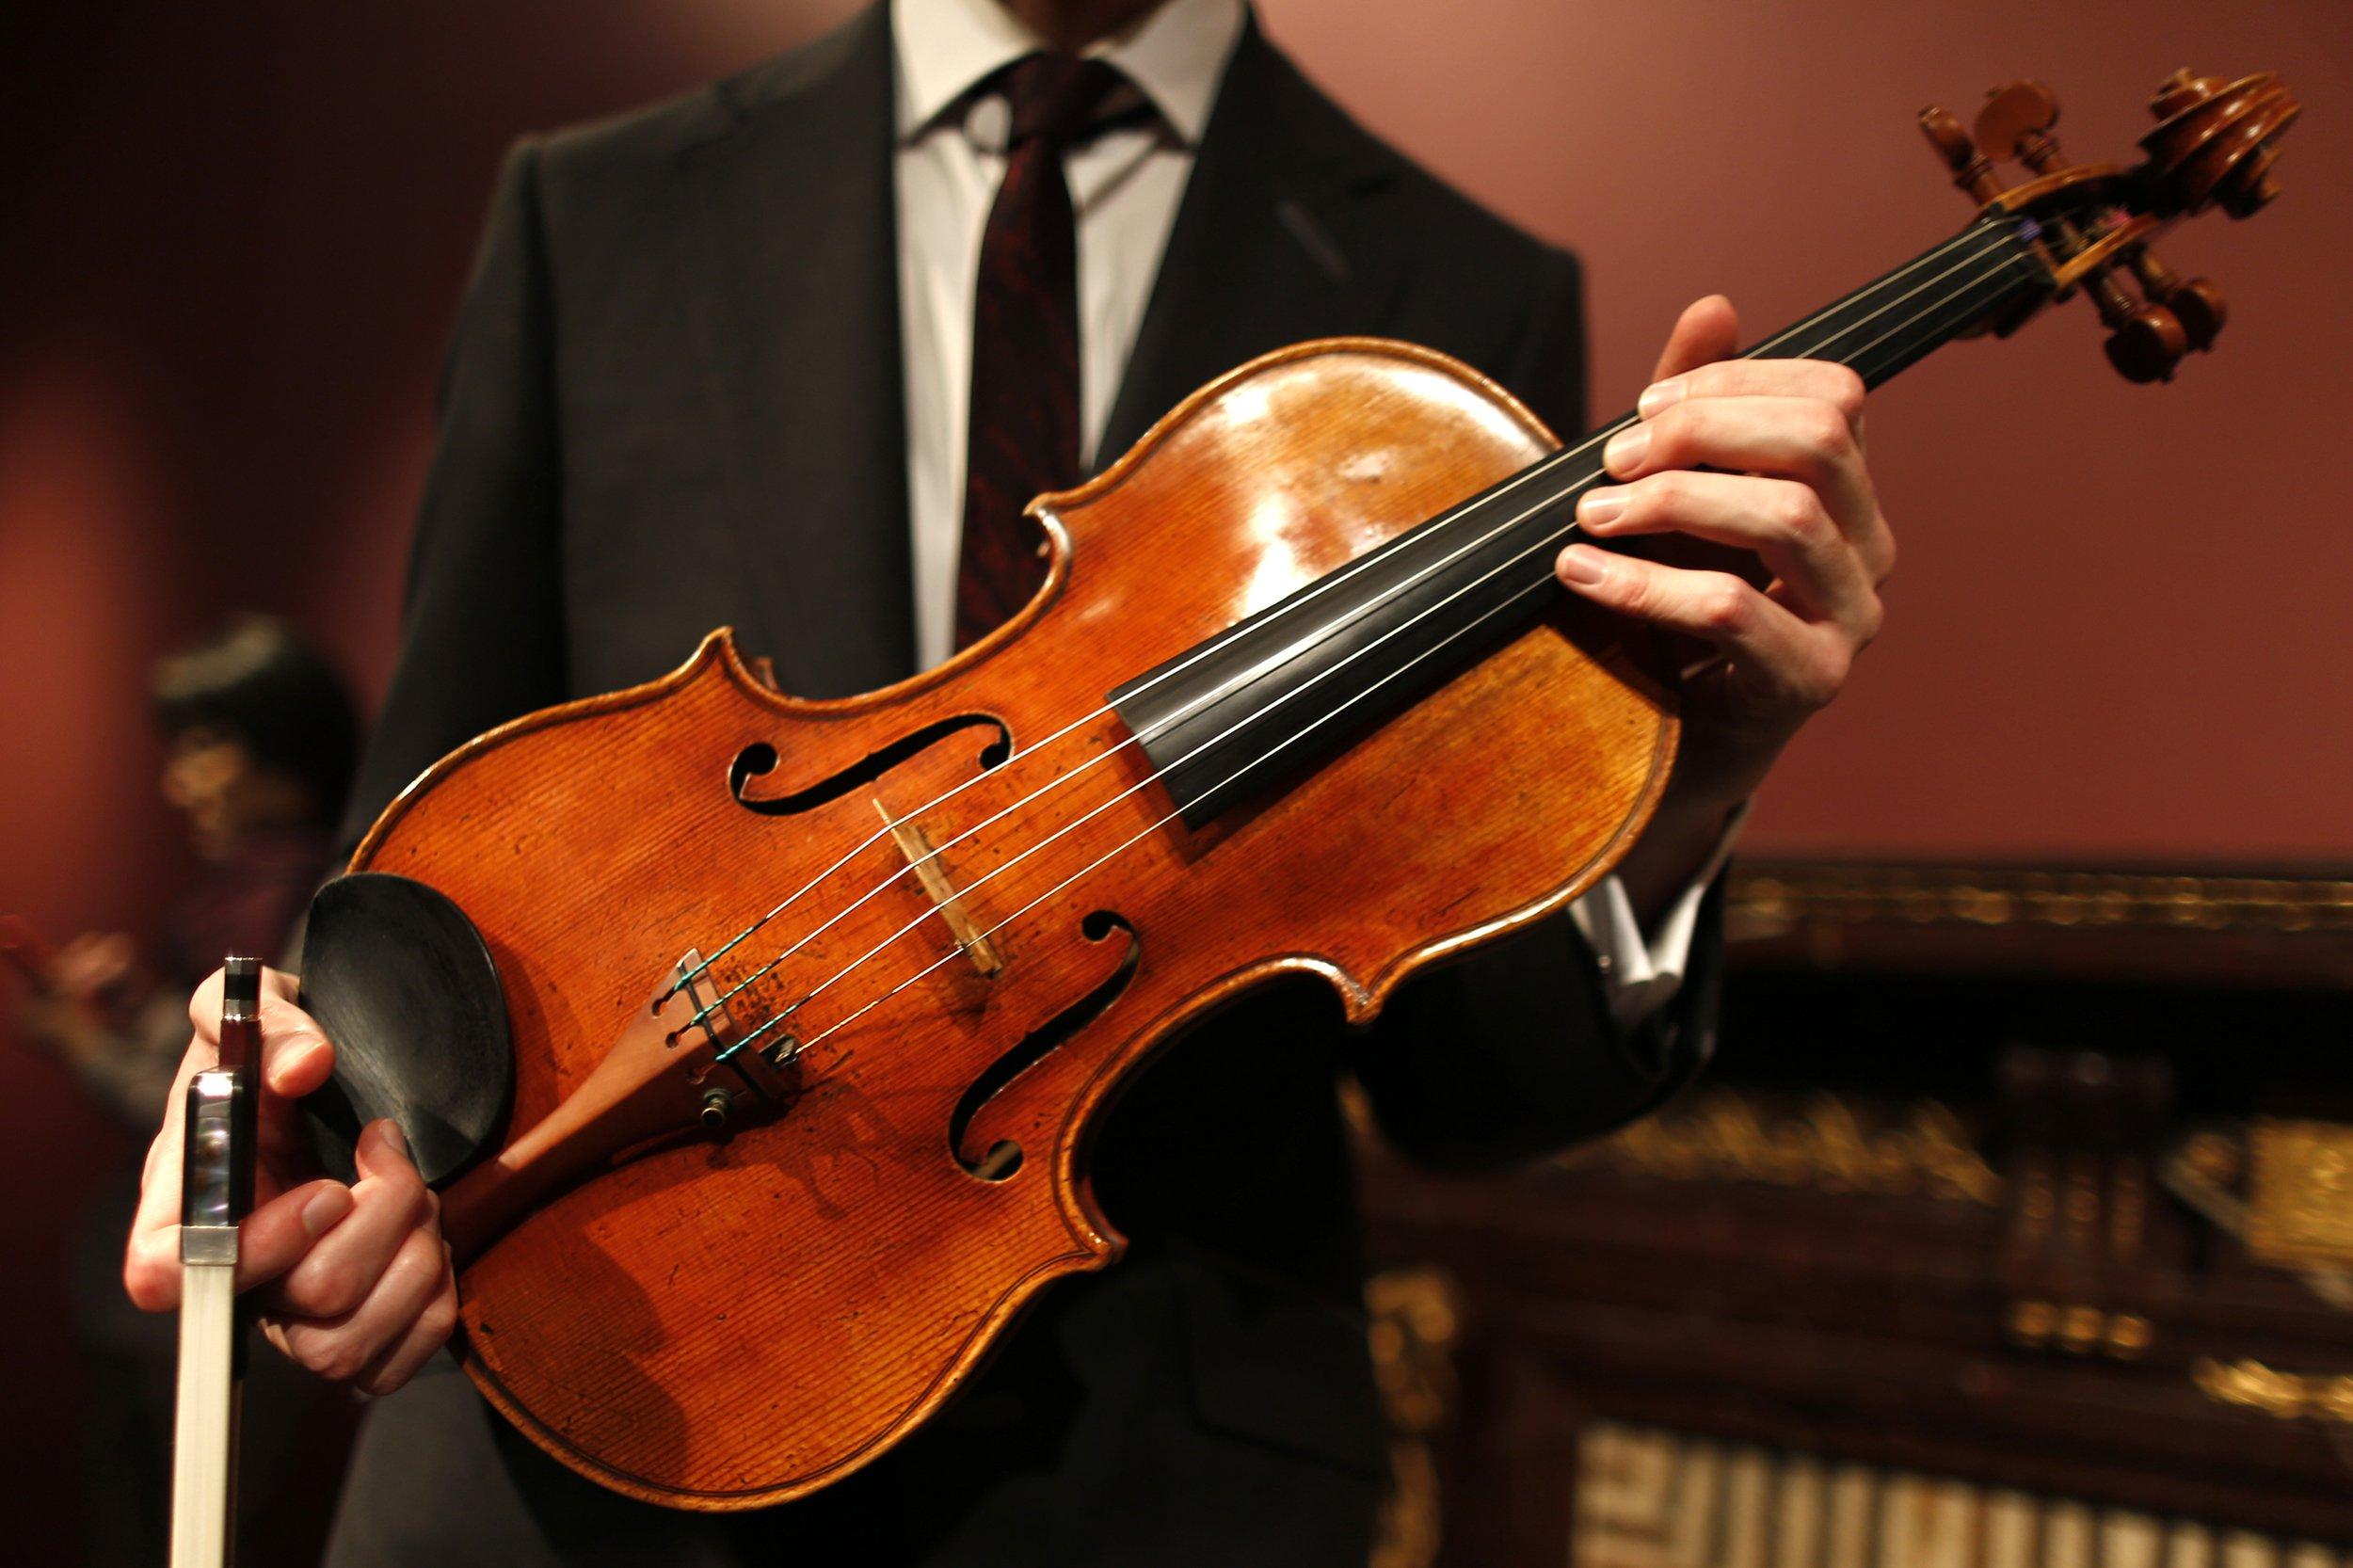 5.23_DT0321_Stradivarius_01